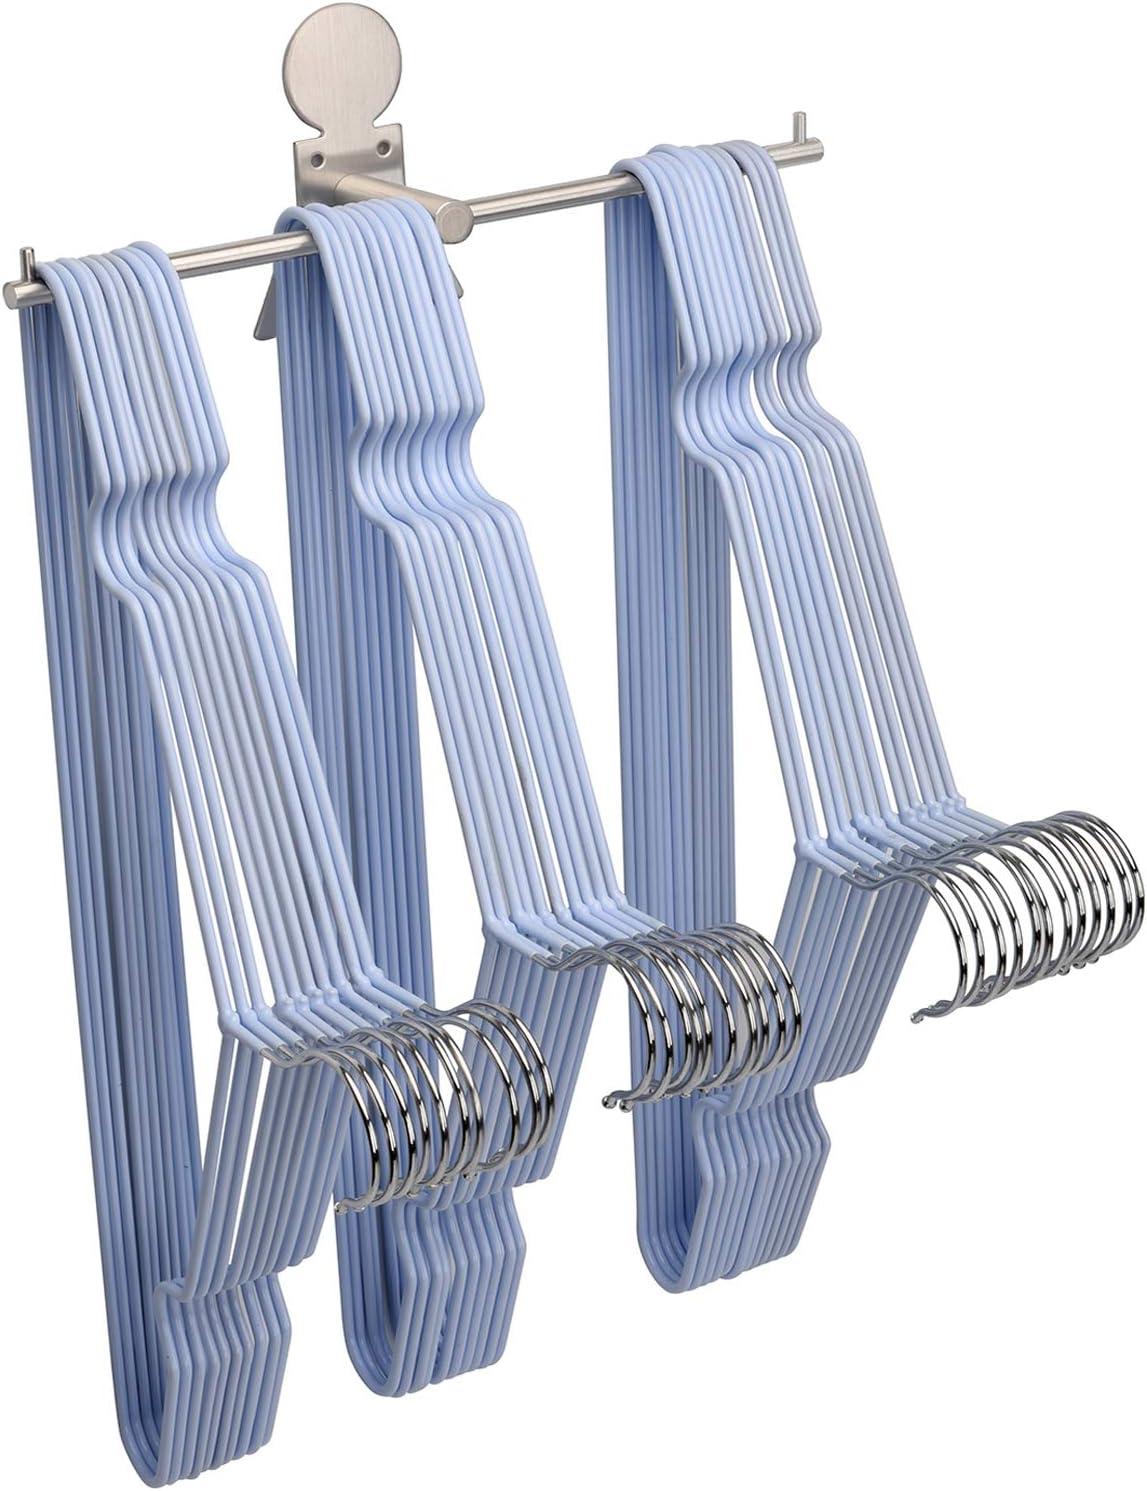 Clothes Hanger Organizer Stacker Super special price Storage Closet for Rack Holder Year-end gift